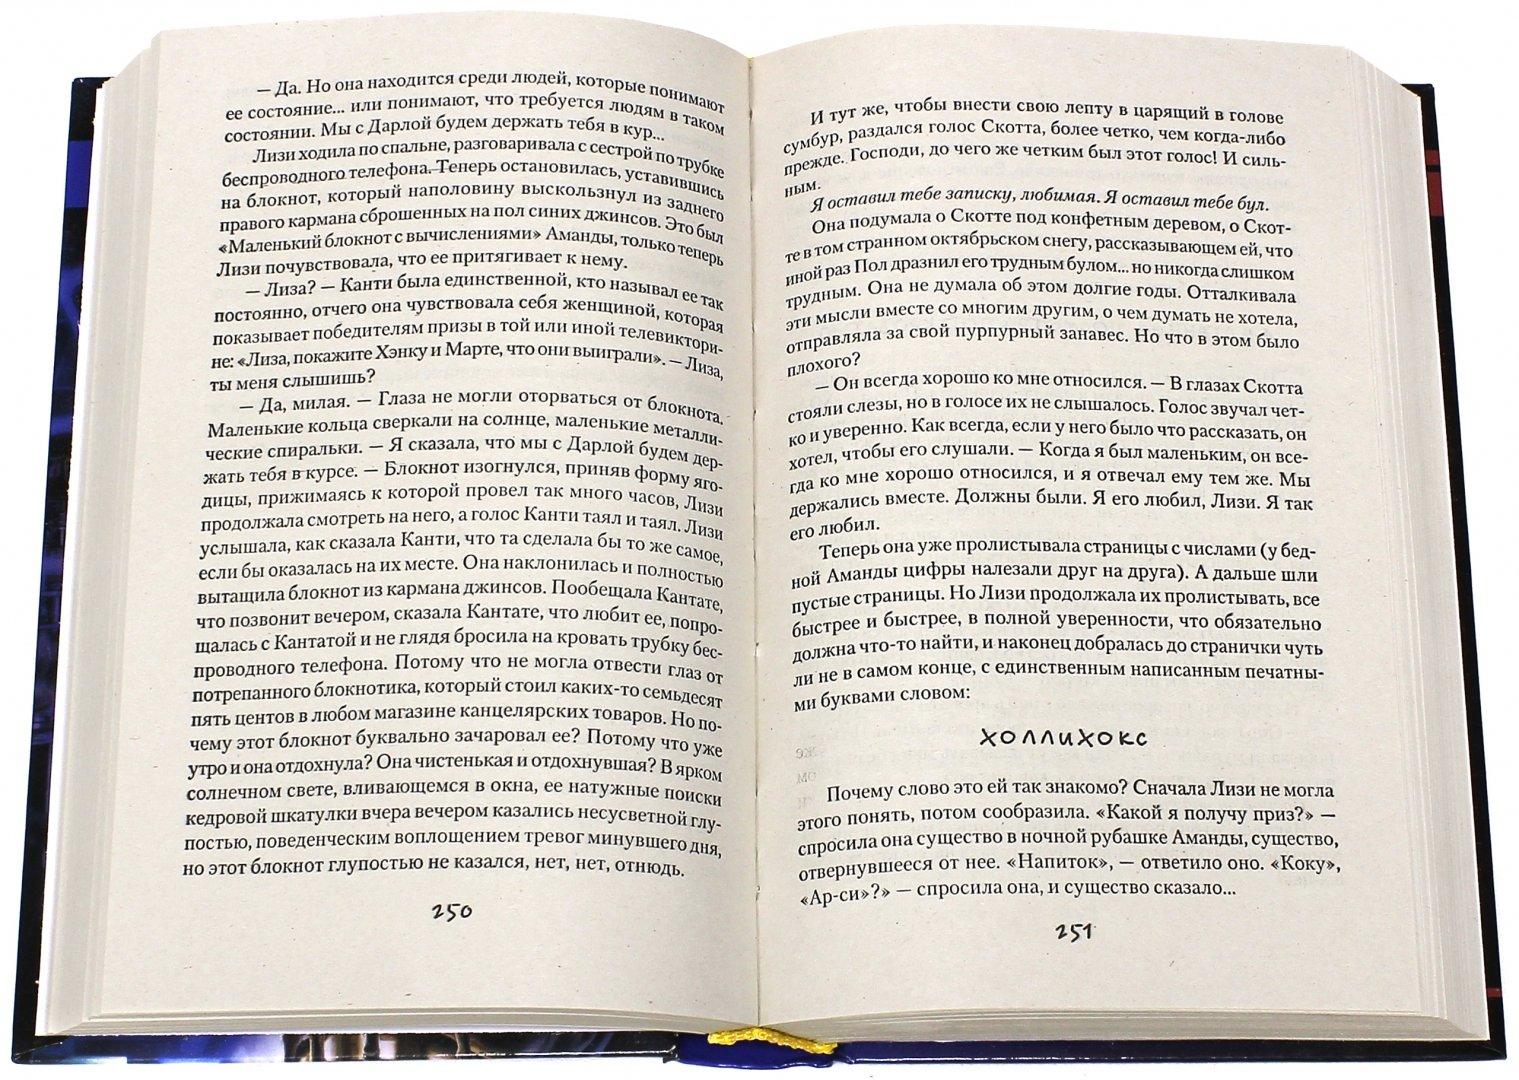 Иллюстрация 1 из 15 для История Лизи - Стивен Кинг | Лабиринт - книги. Источник: Лабиринт